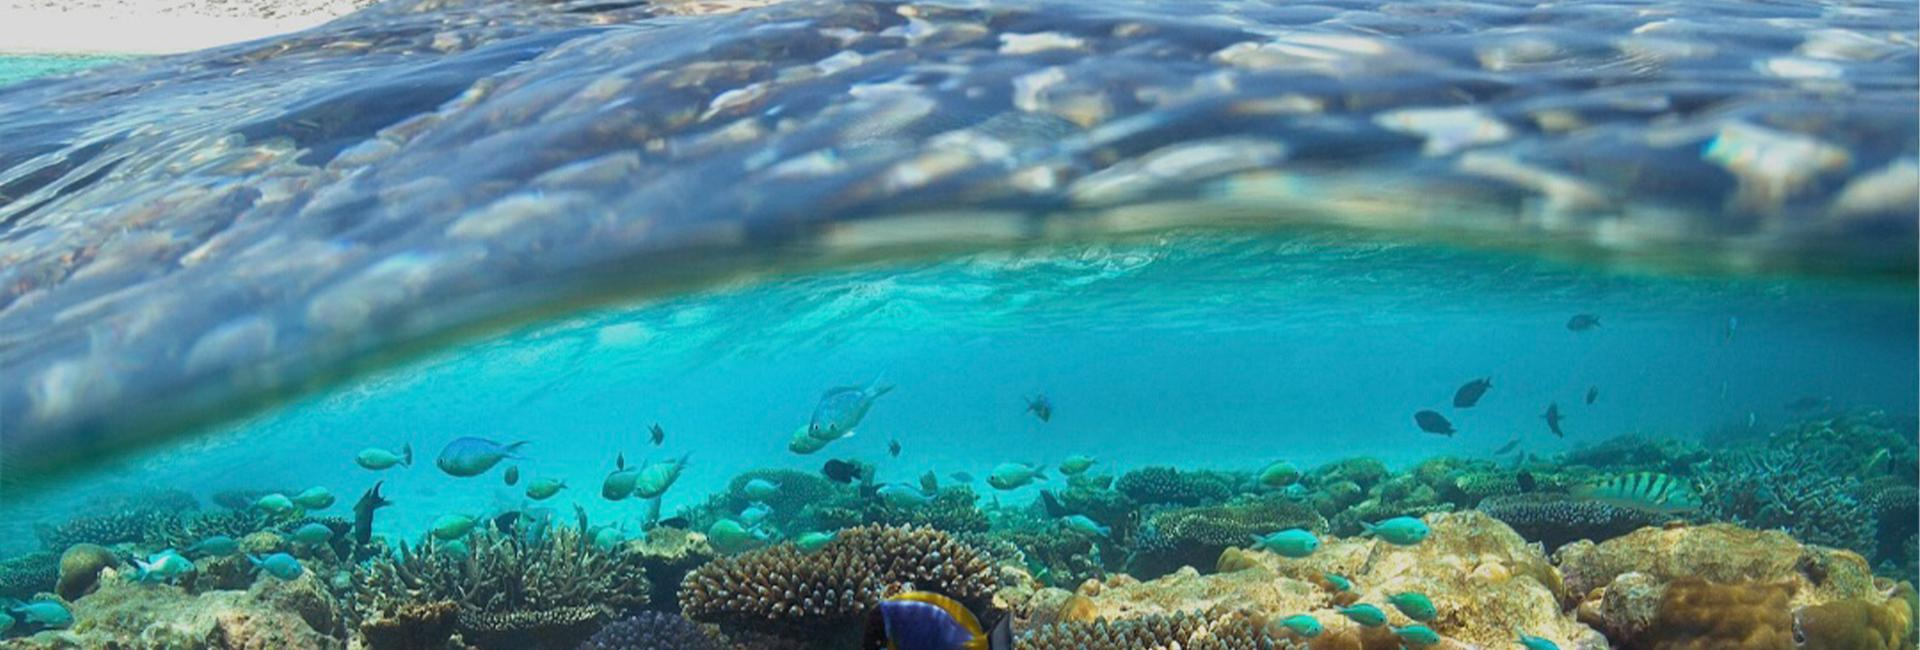 World Reef Day